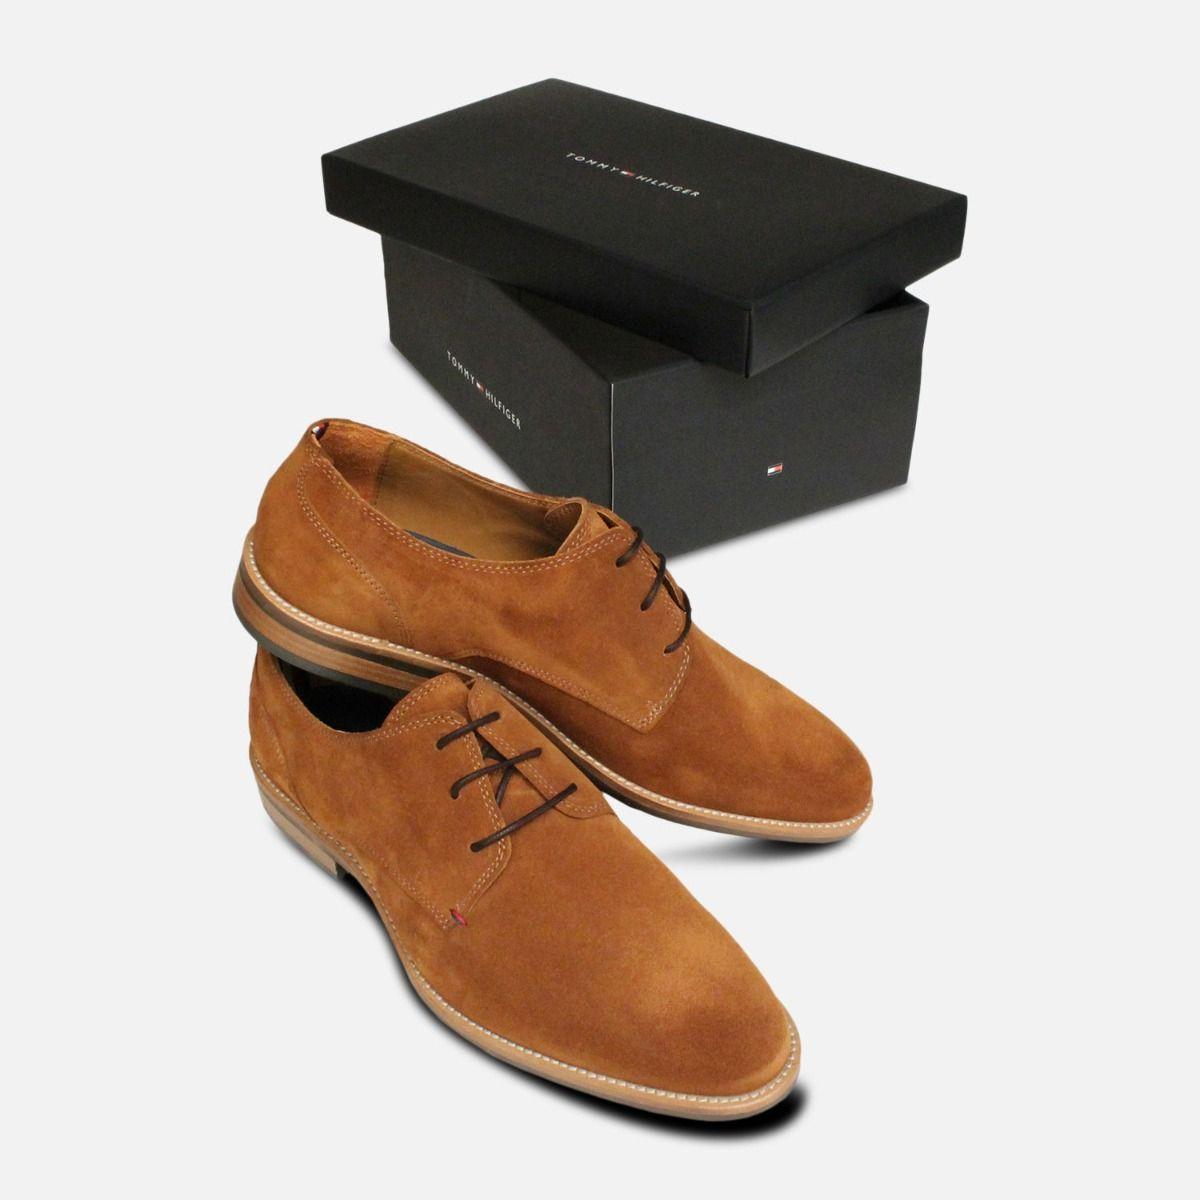 Tommy Hilfiger Cognac Suede Mens Daytona Shoes